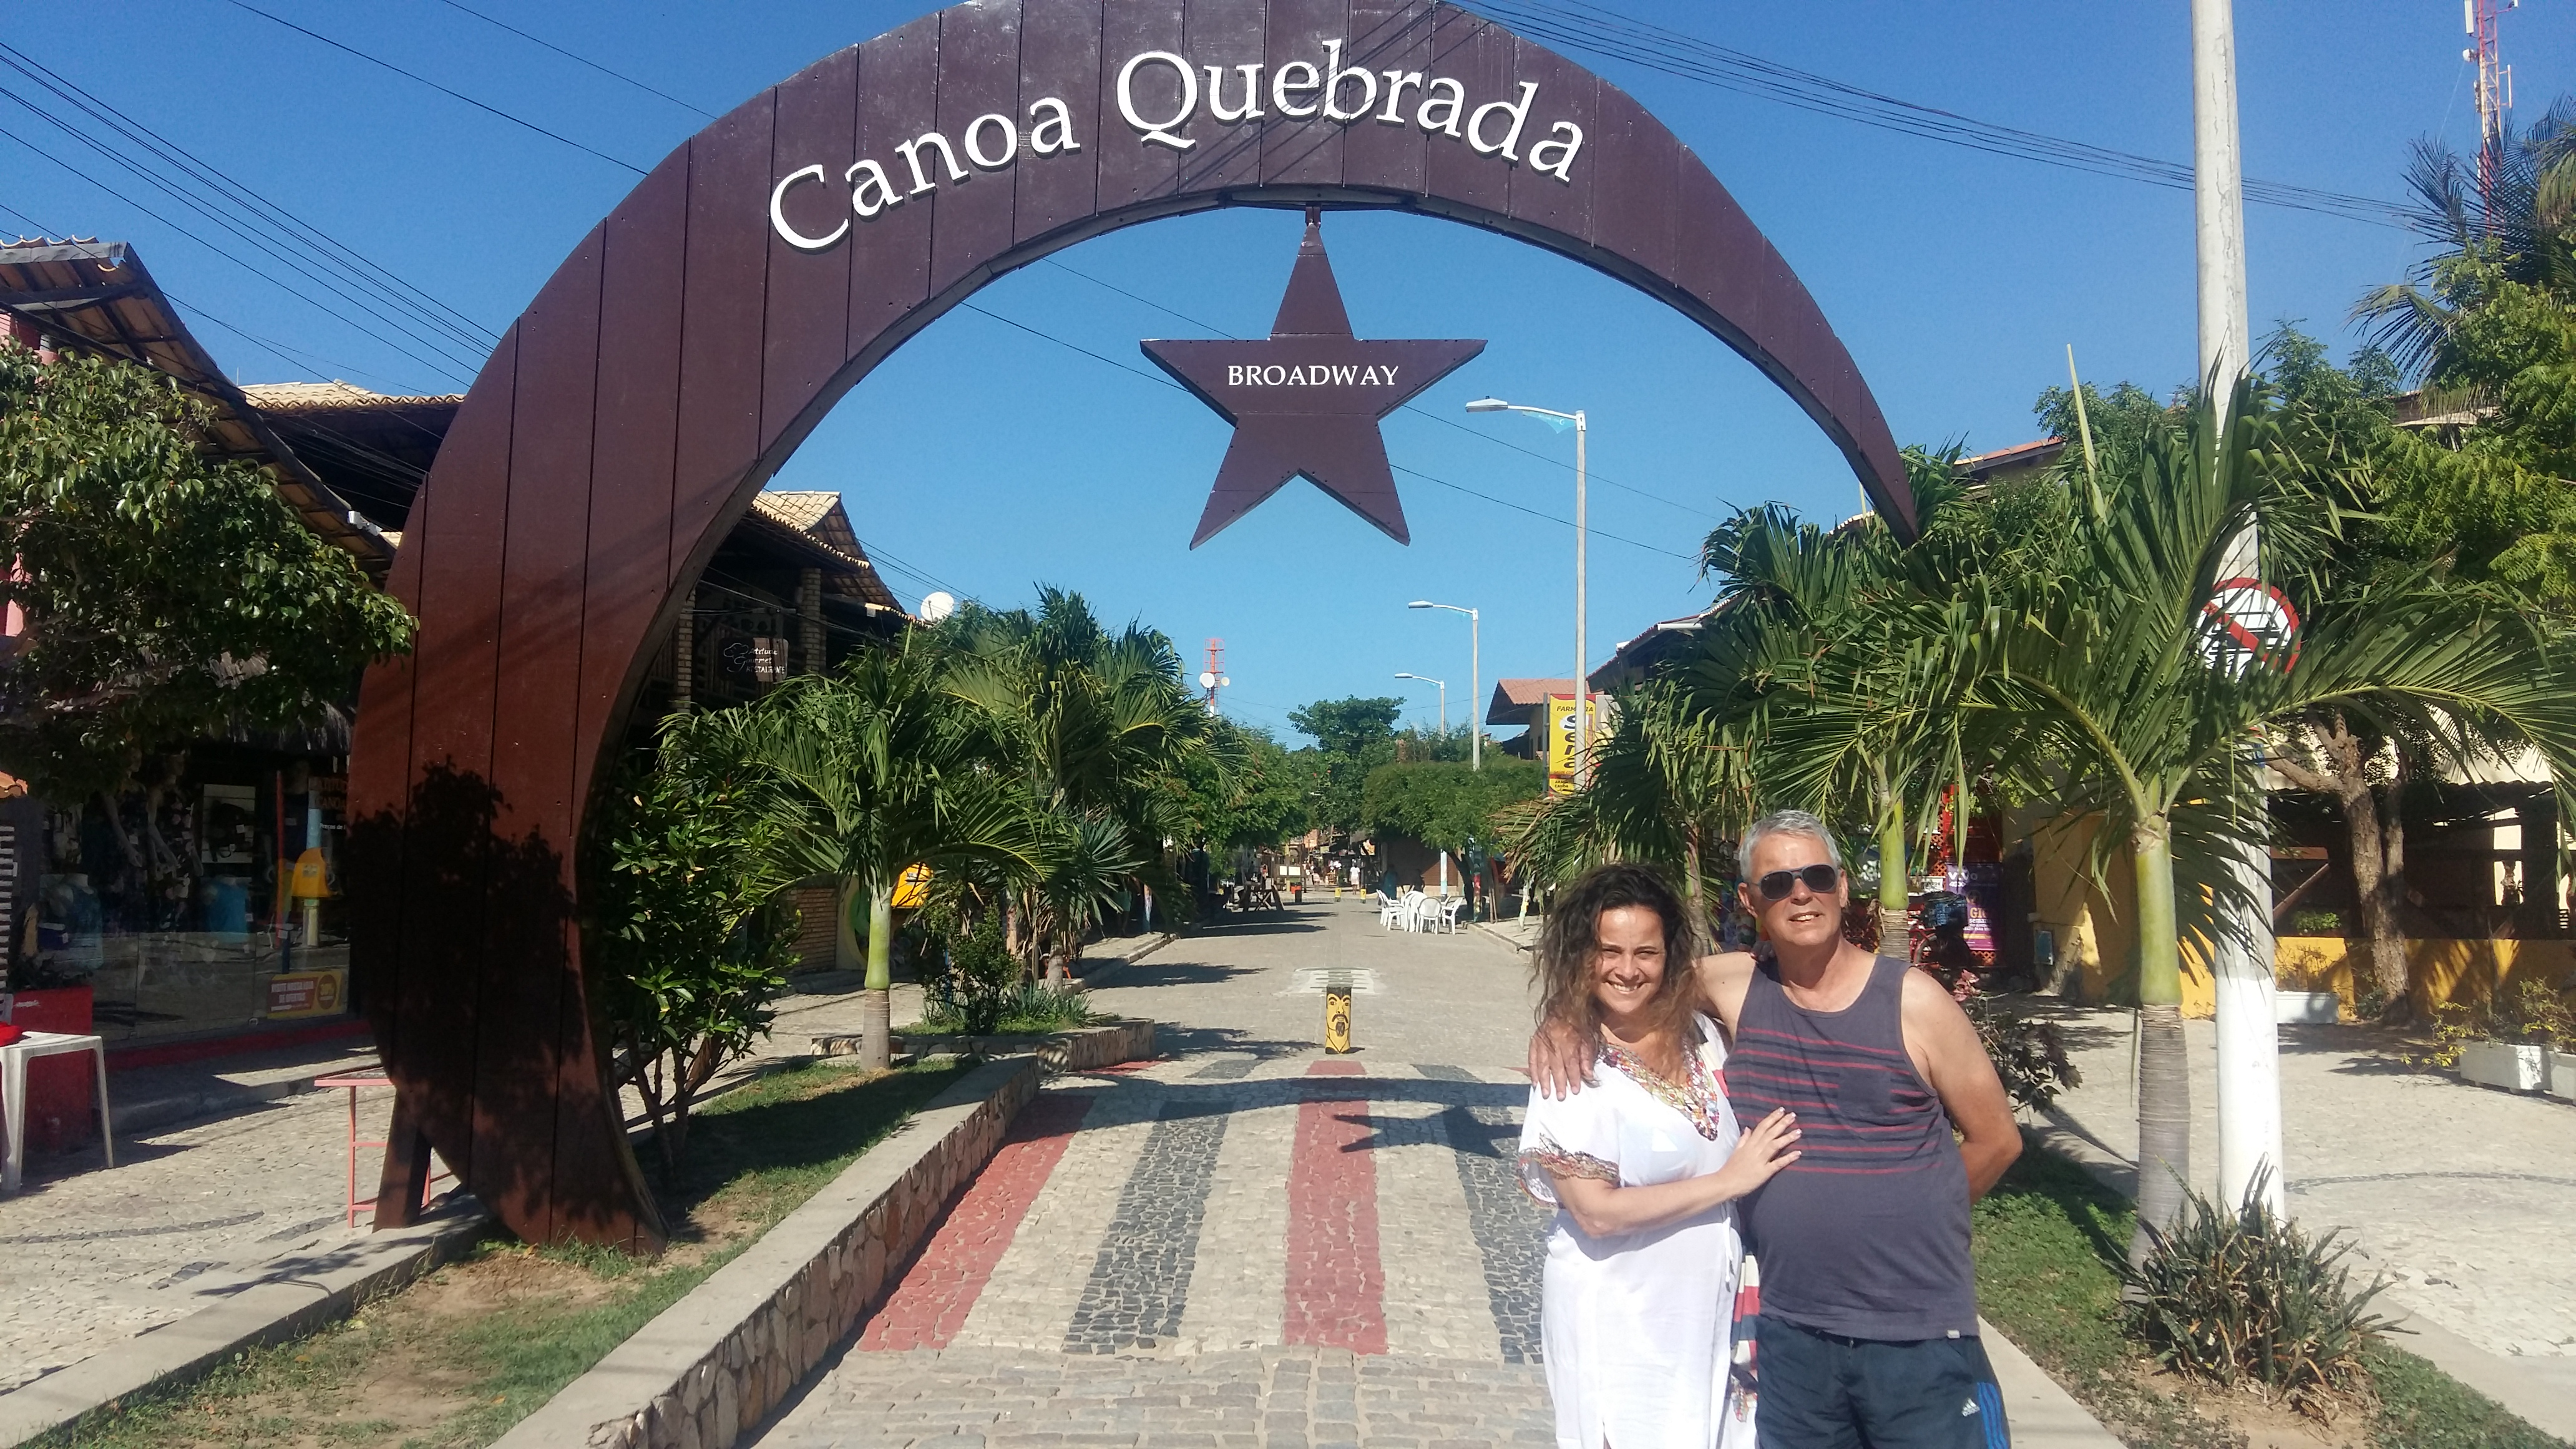 BROADWAY - CANOA QUEBRADA